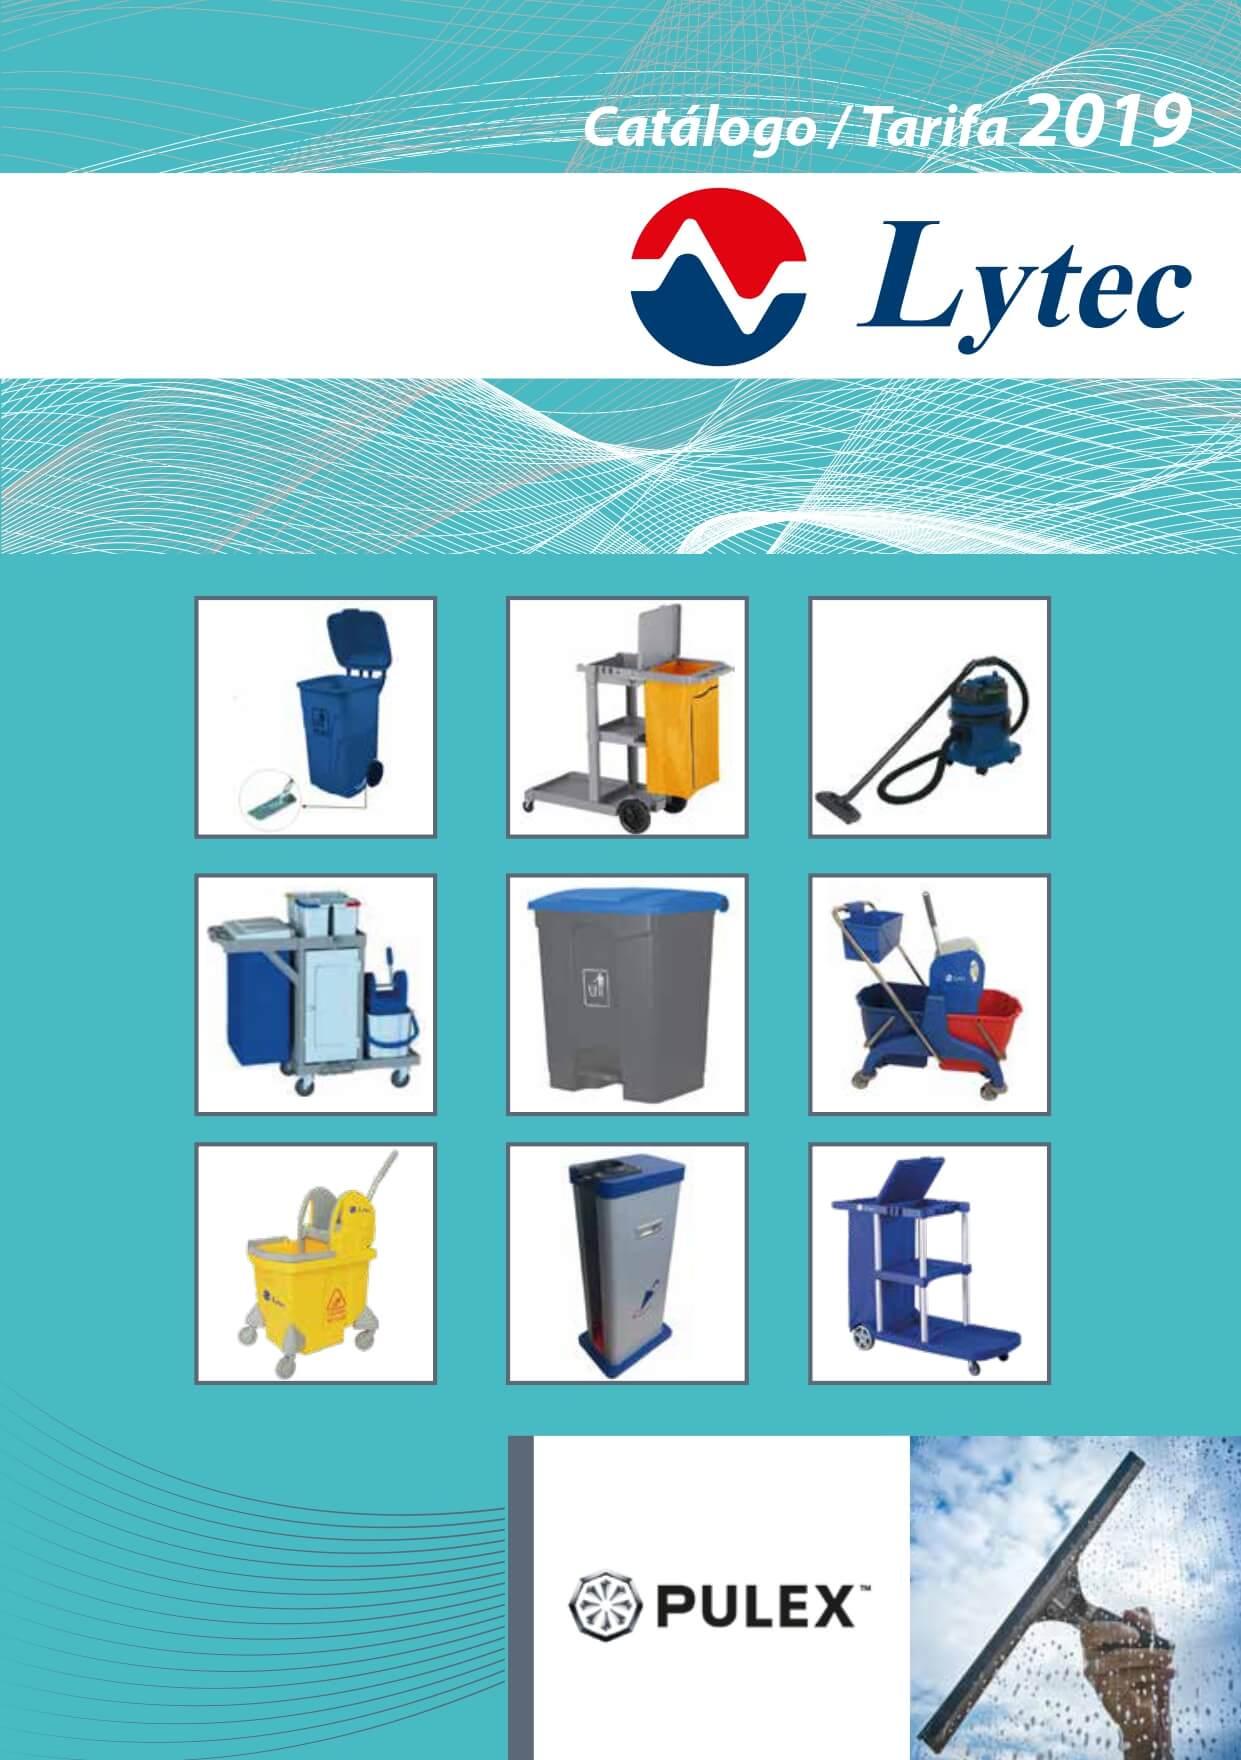 Catálogo de carros de limpieza Lytec